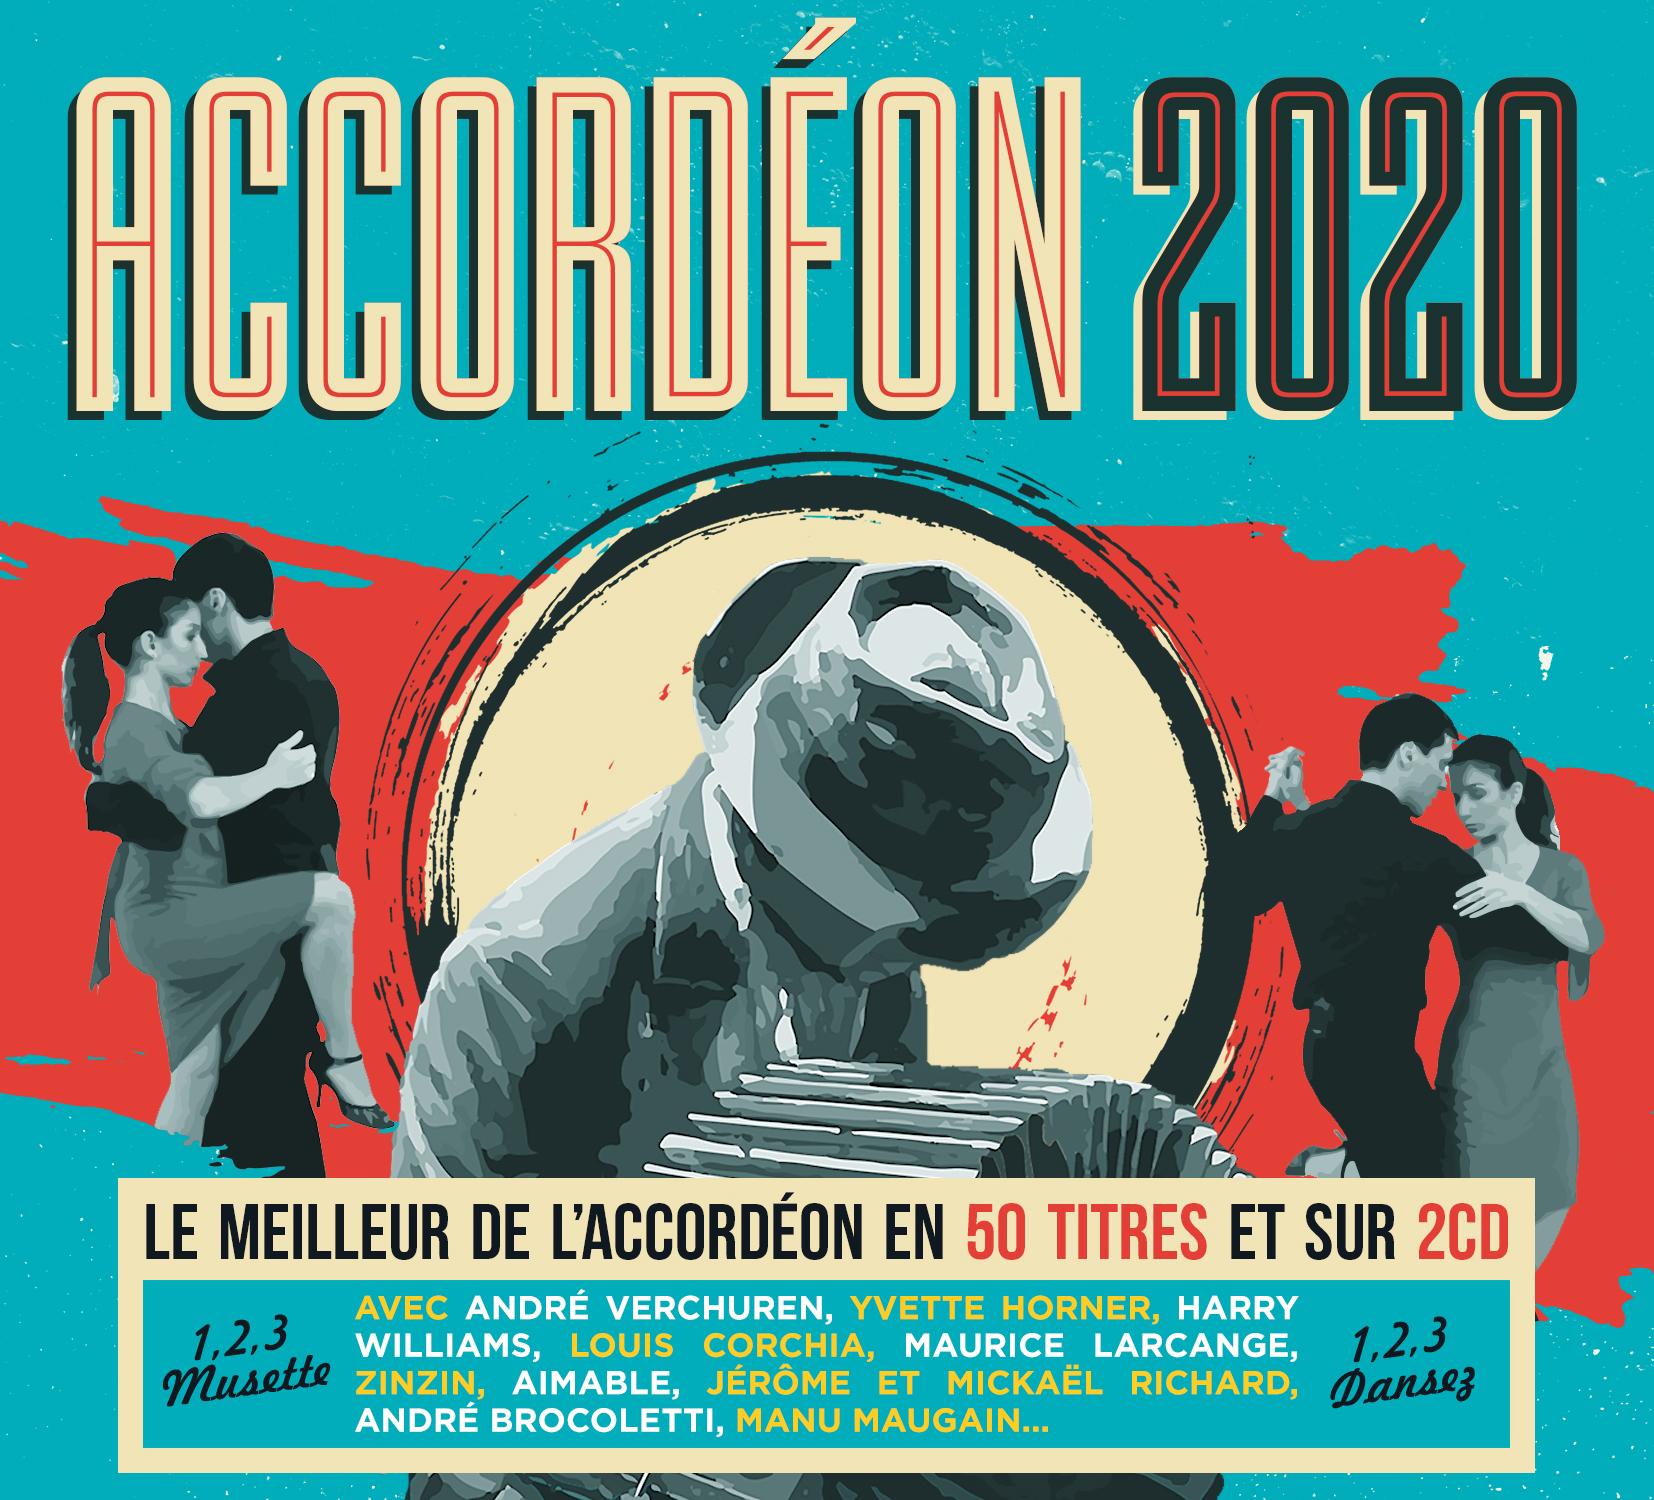 Accordéon 2020